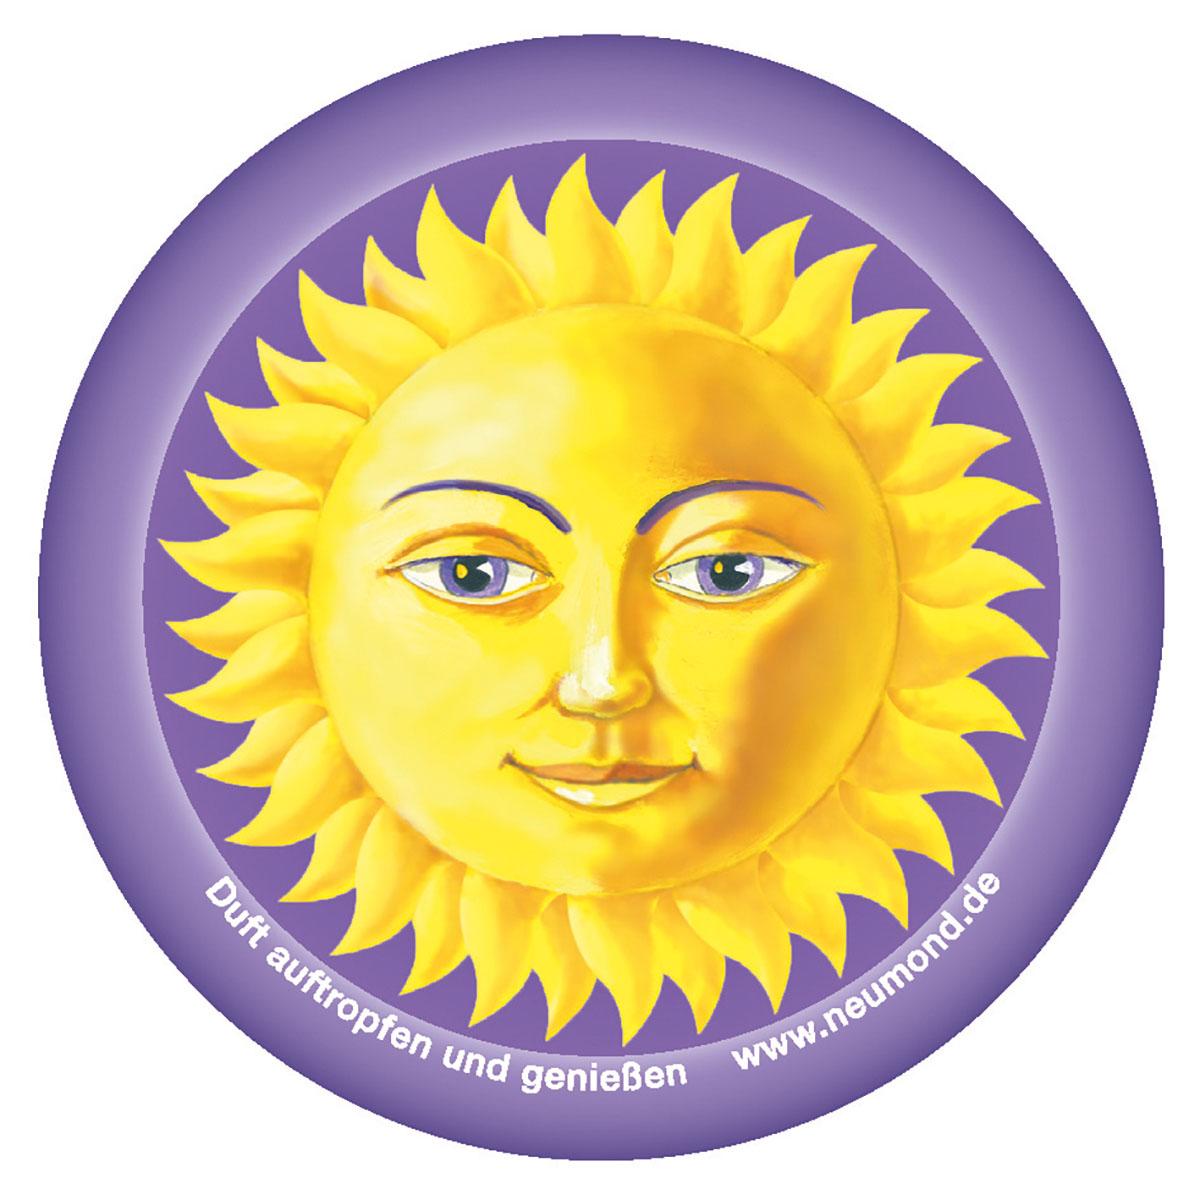 Duft-Vlies Sonne mit Kordel, 10er-Pack, 1Pk.